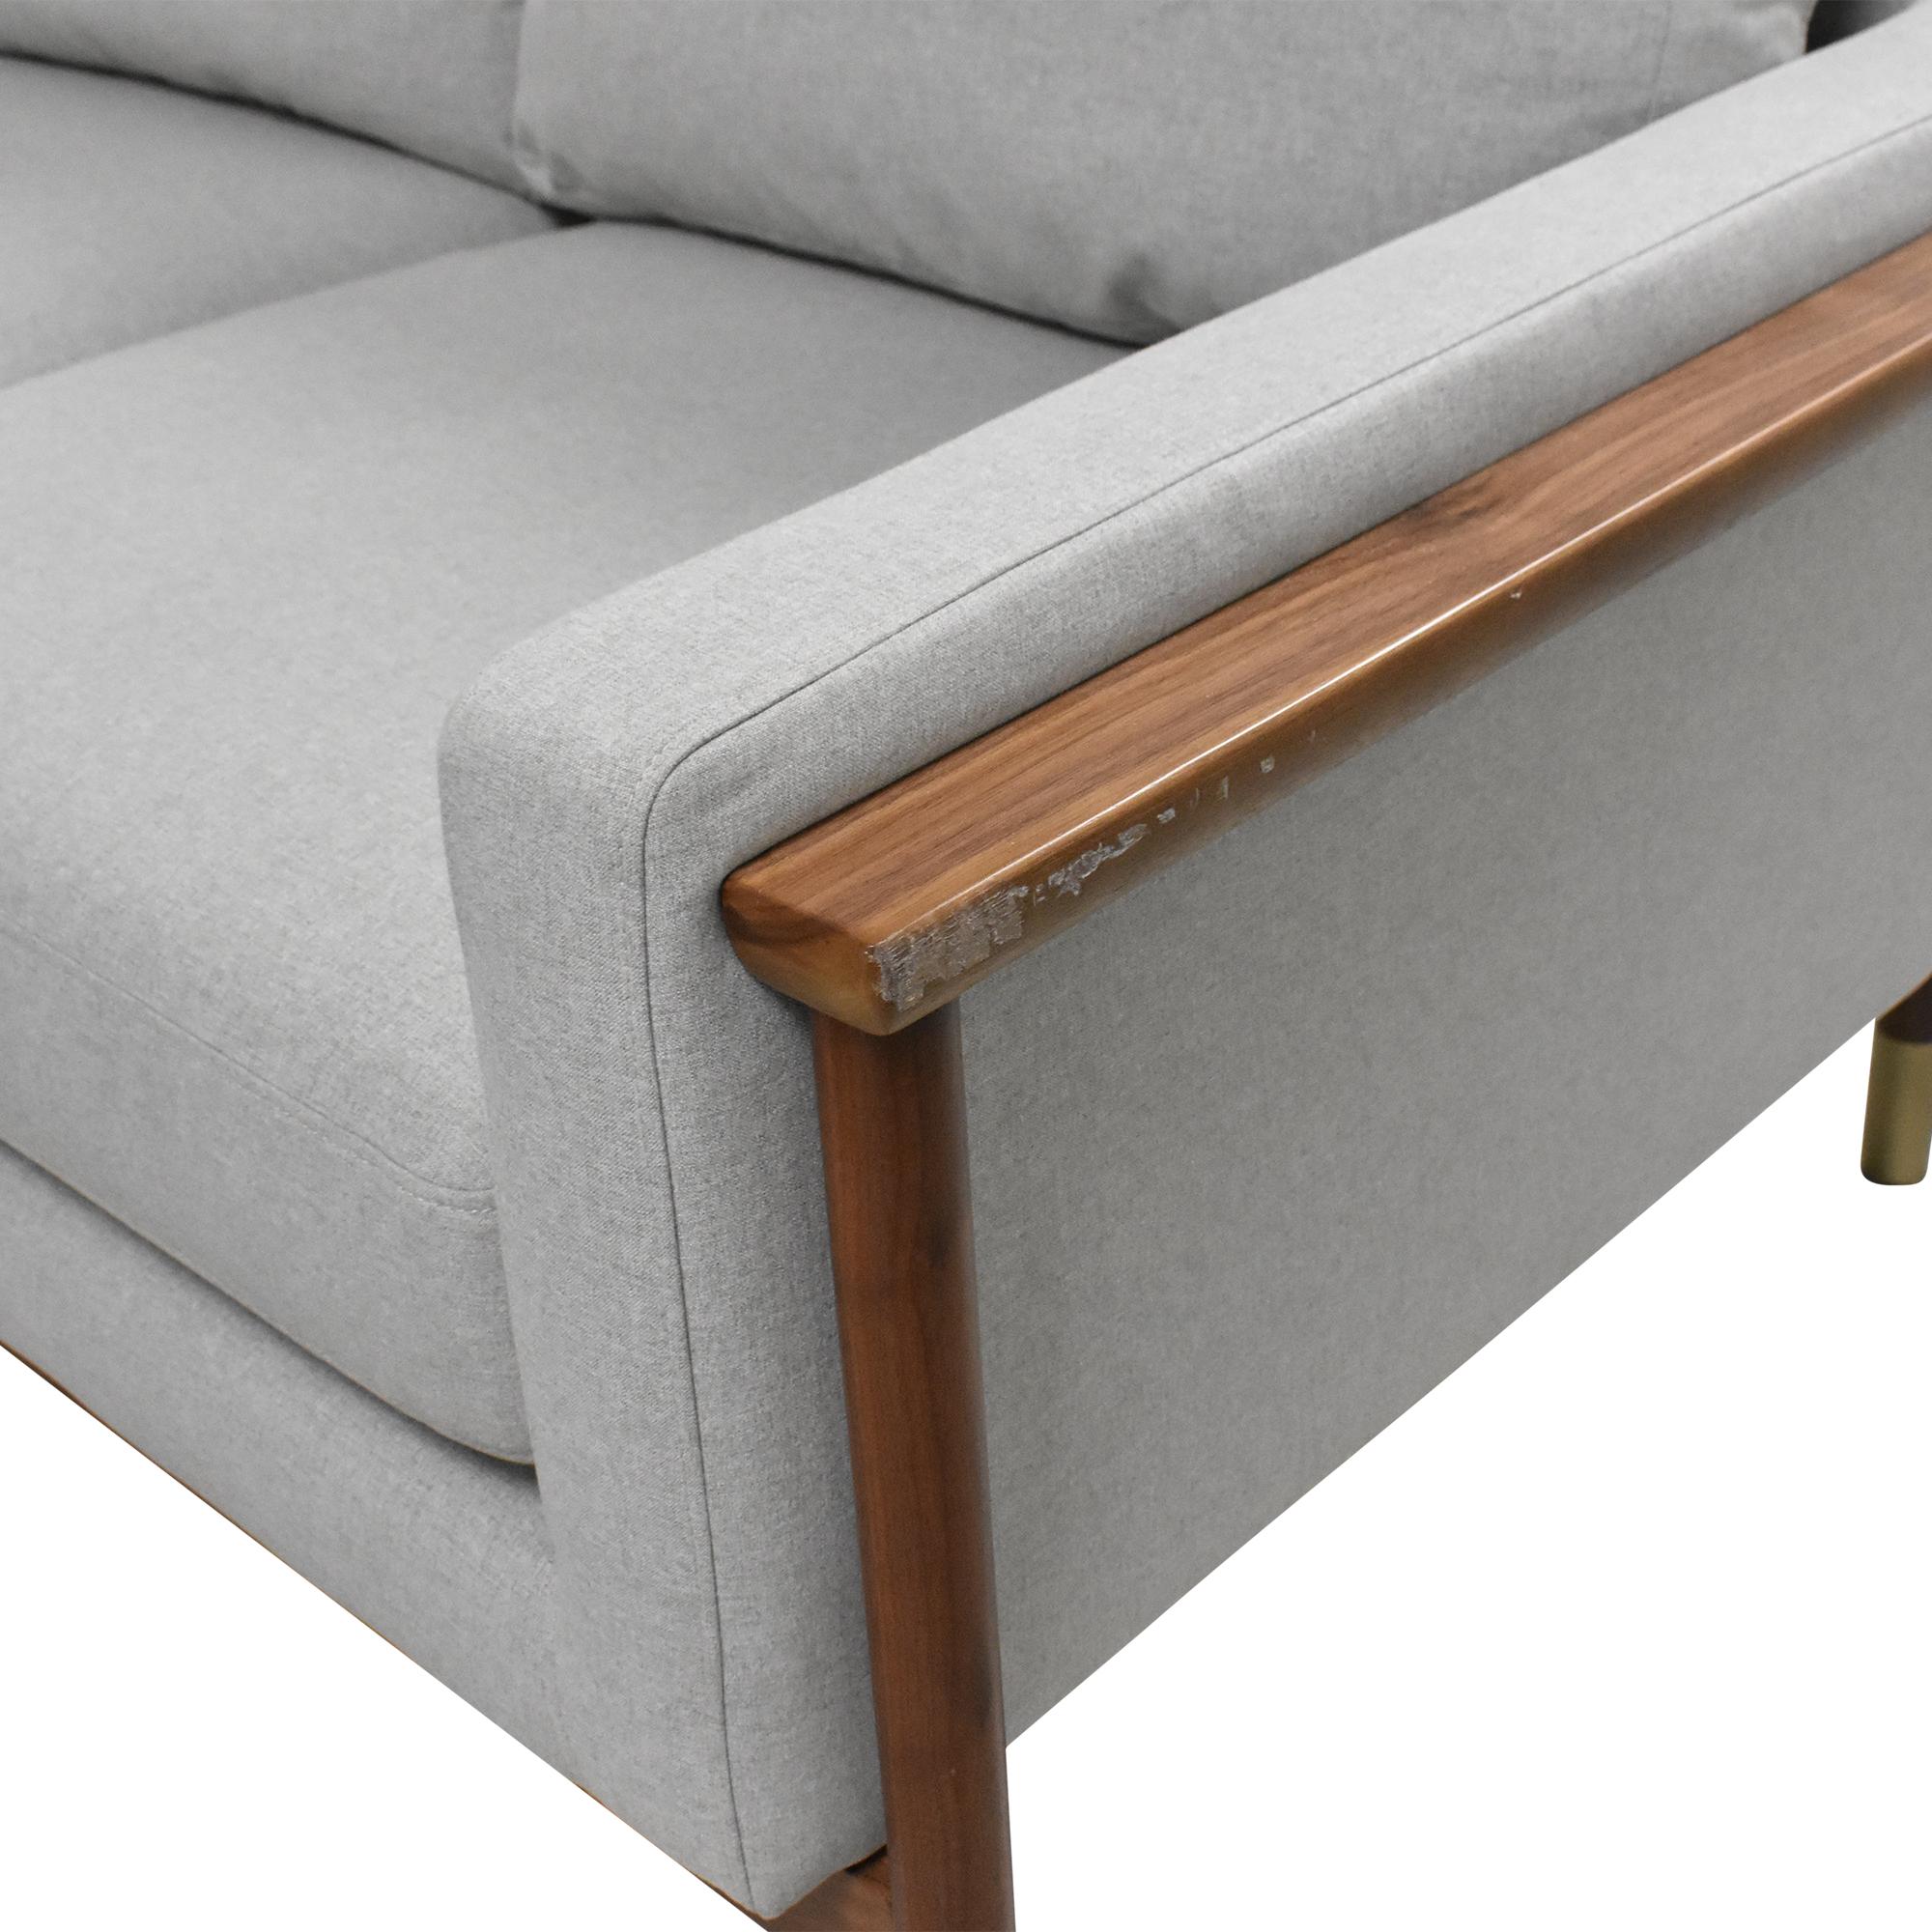 Interior Define Interior Define Jason Wu Loveseat Sofa on sale